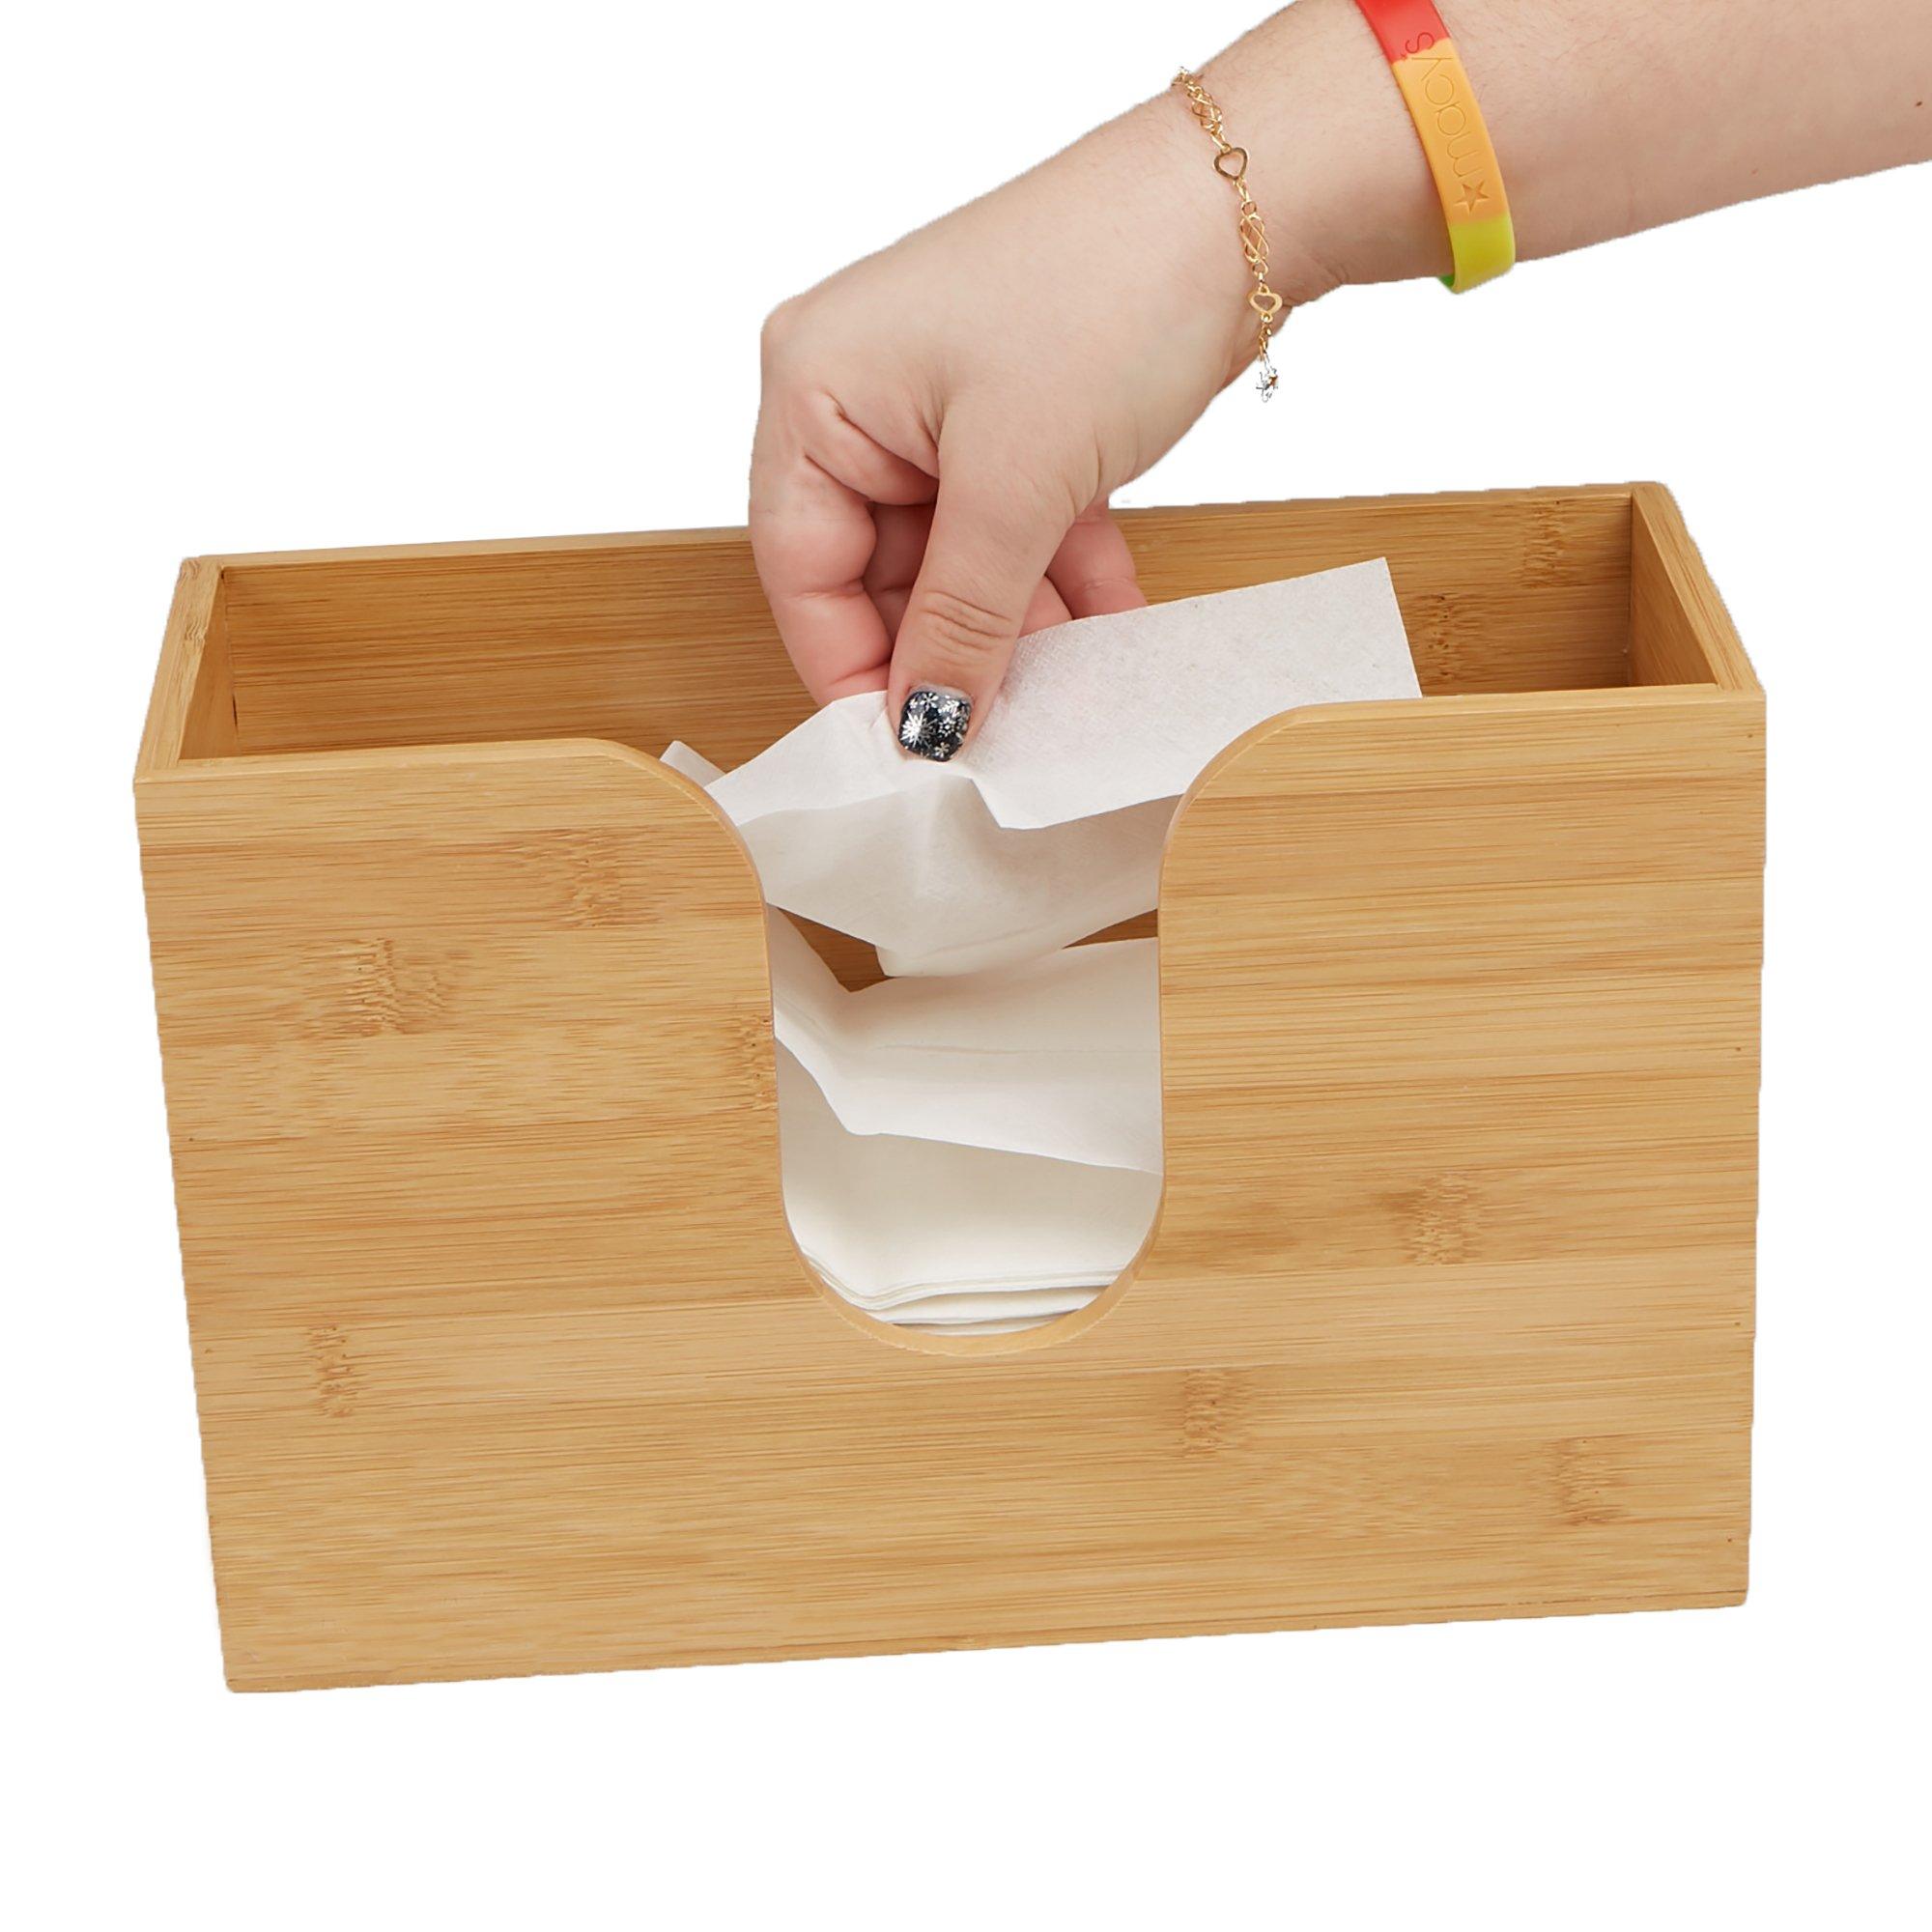 Mind Reader Bamboo Wall Mount Interfold Napkin Dispenser Organizer, Brown by Mind Reader (Image #2)